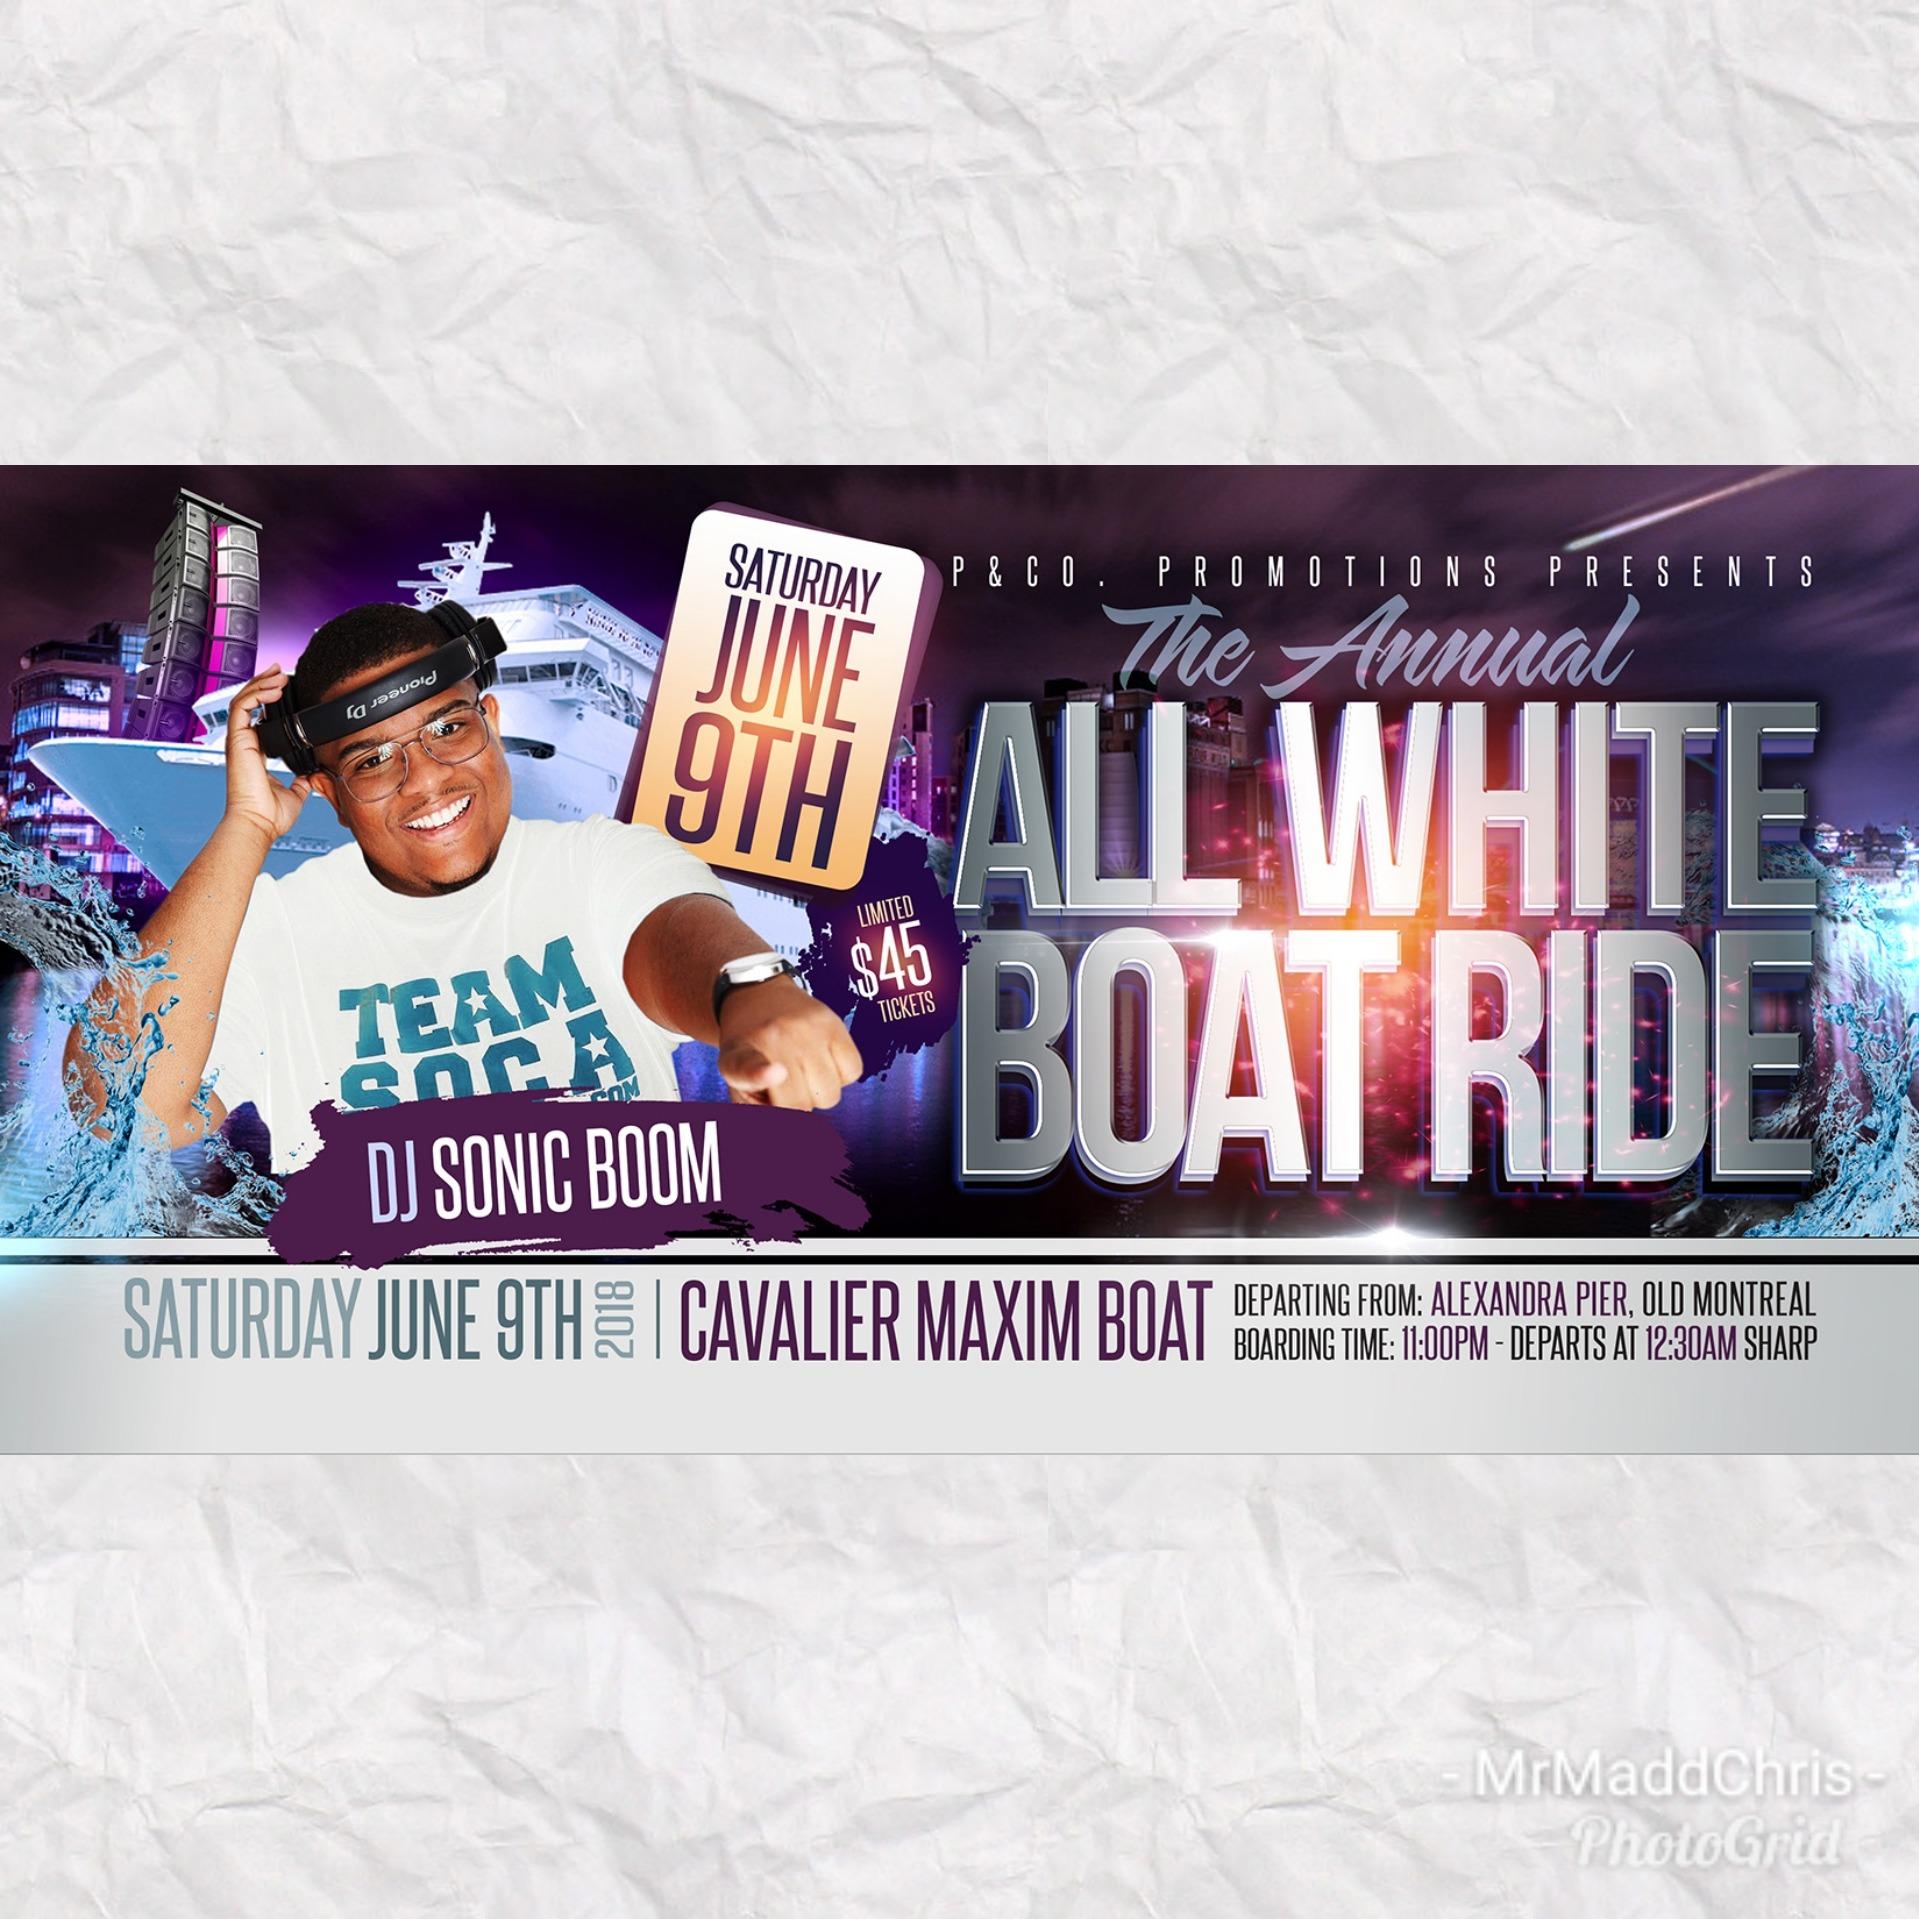 All White Boat Ride 2018